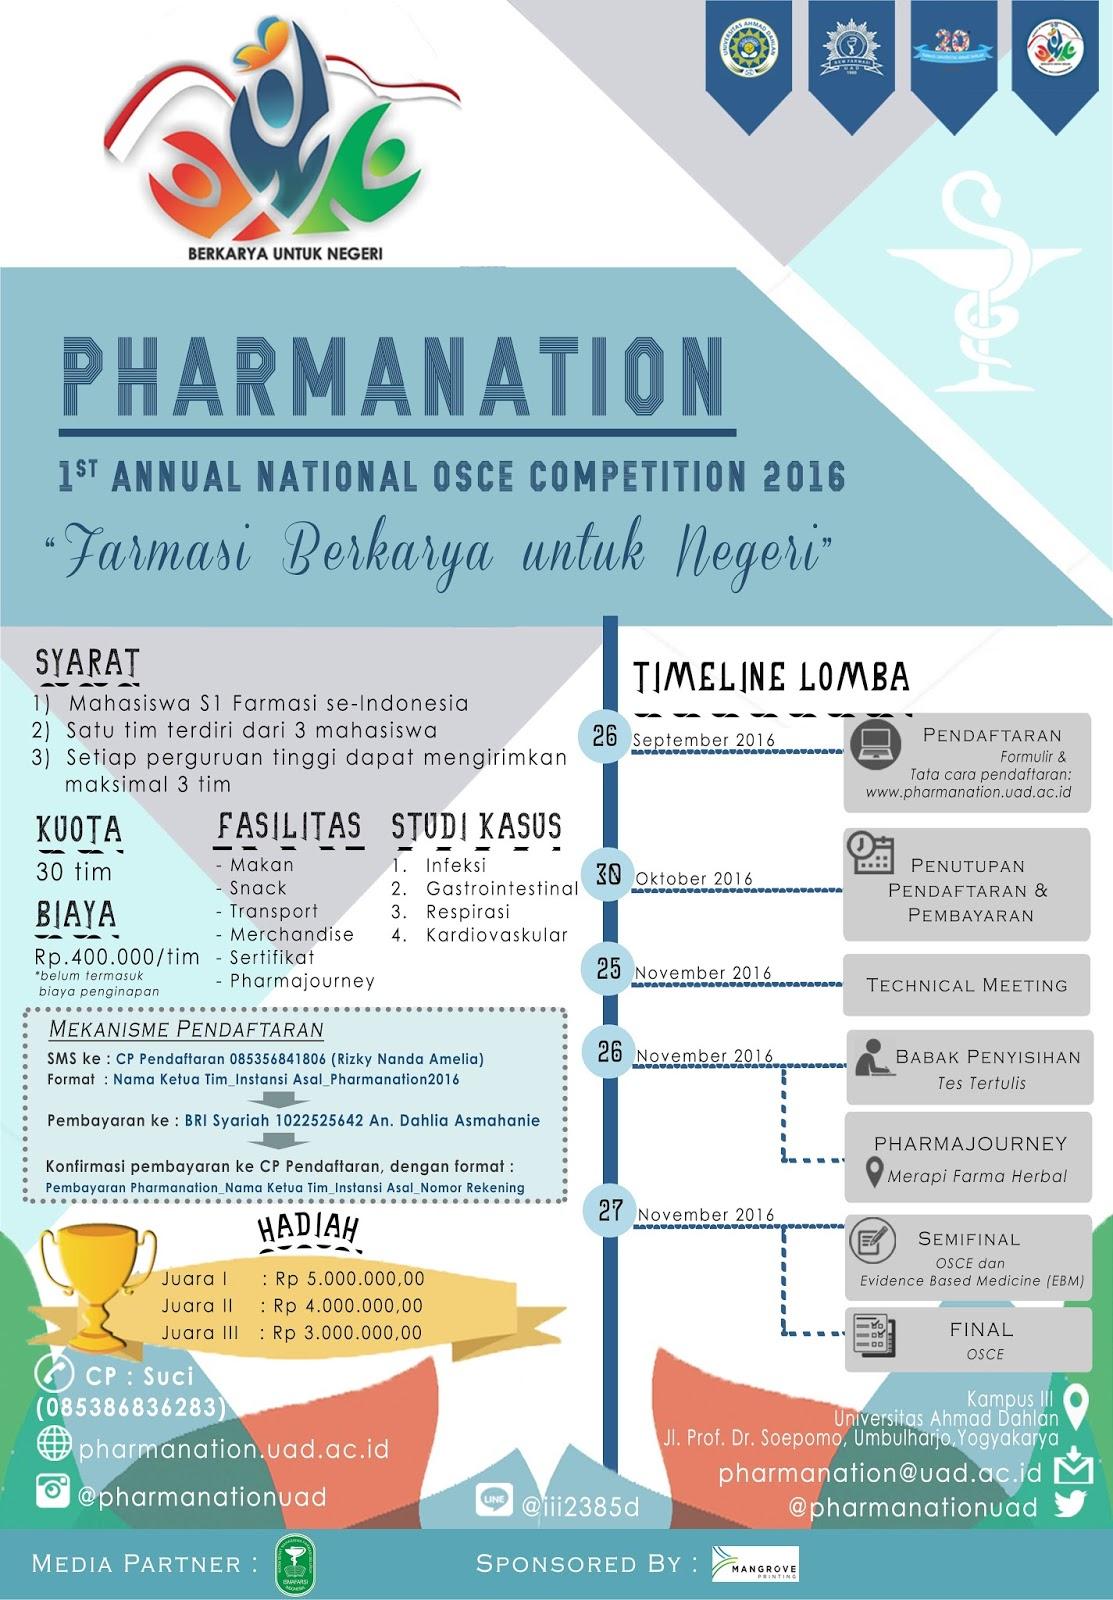 PHARMANATION 2016